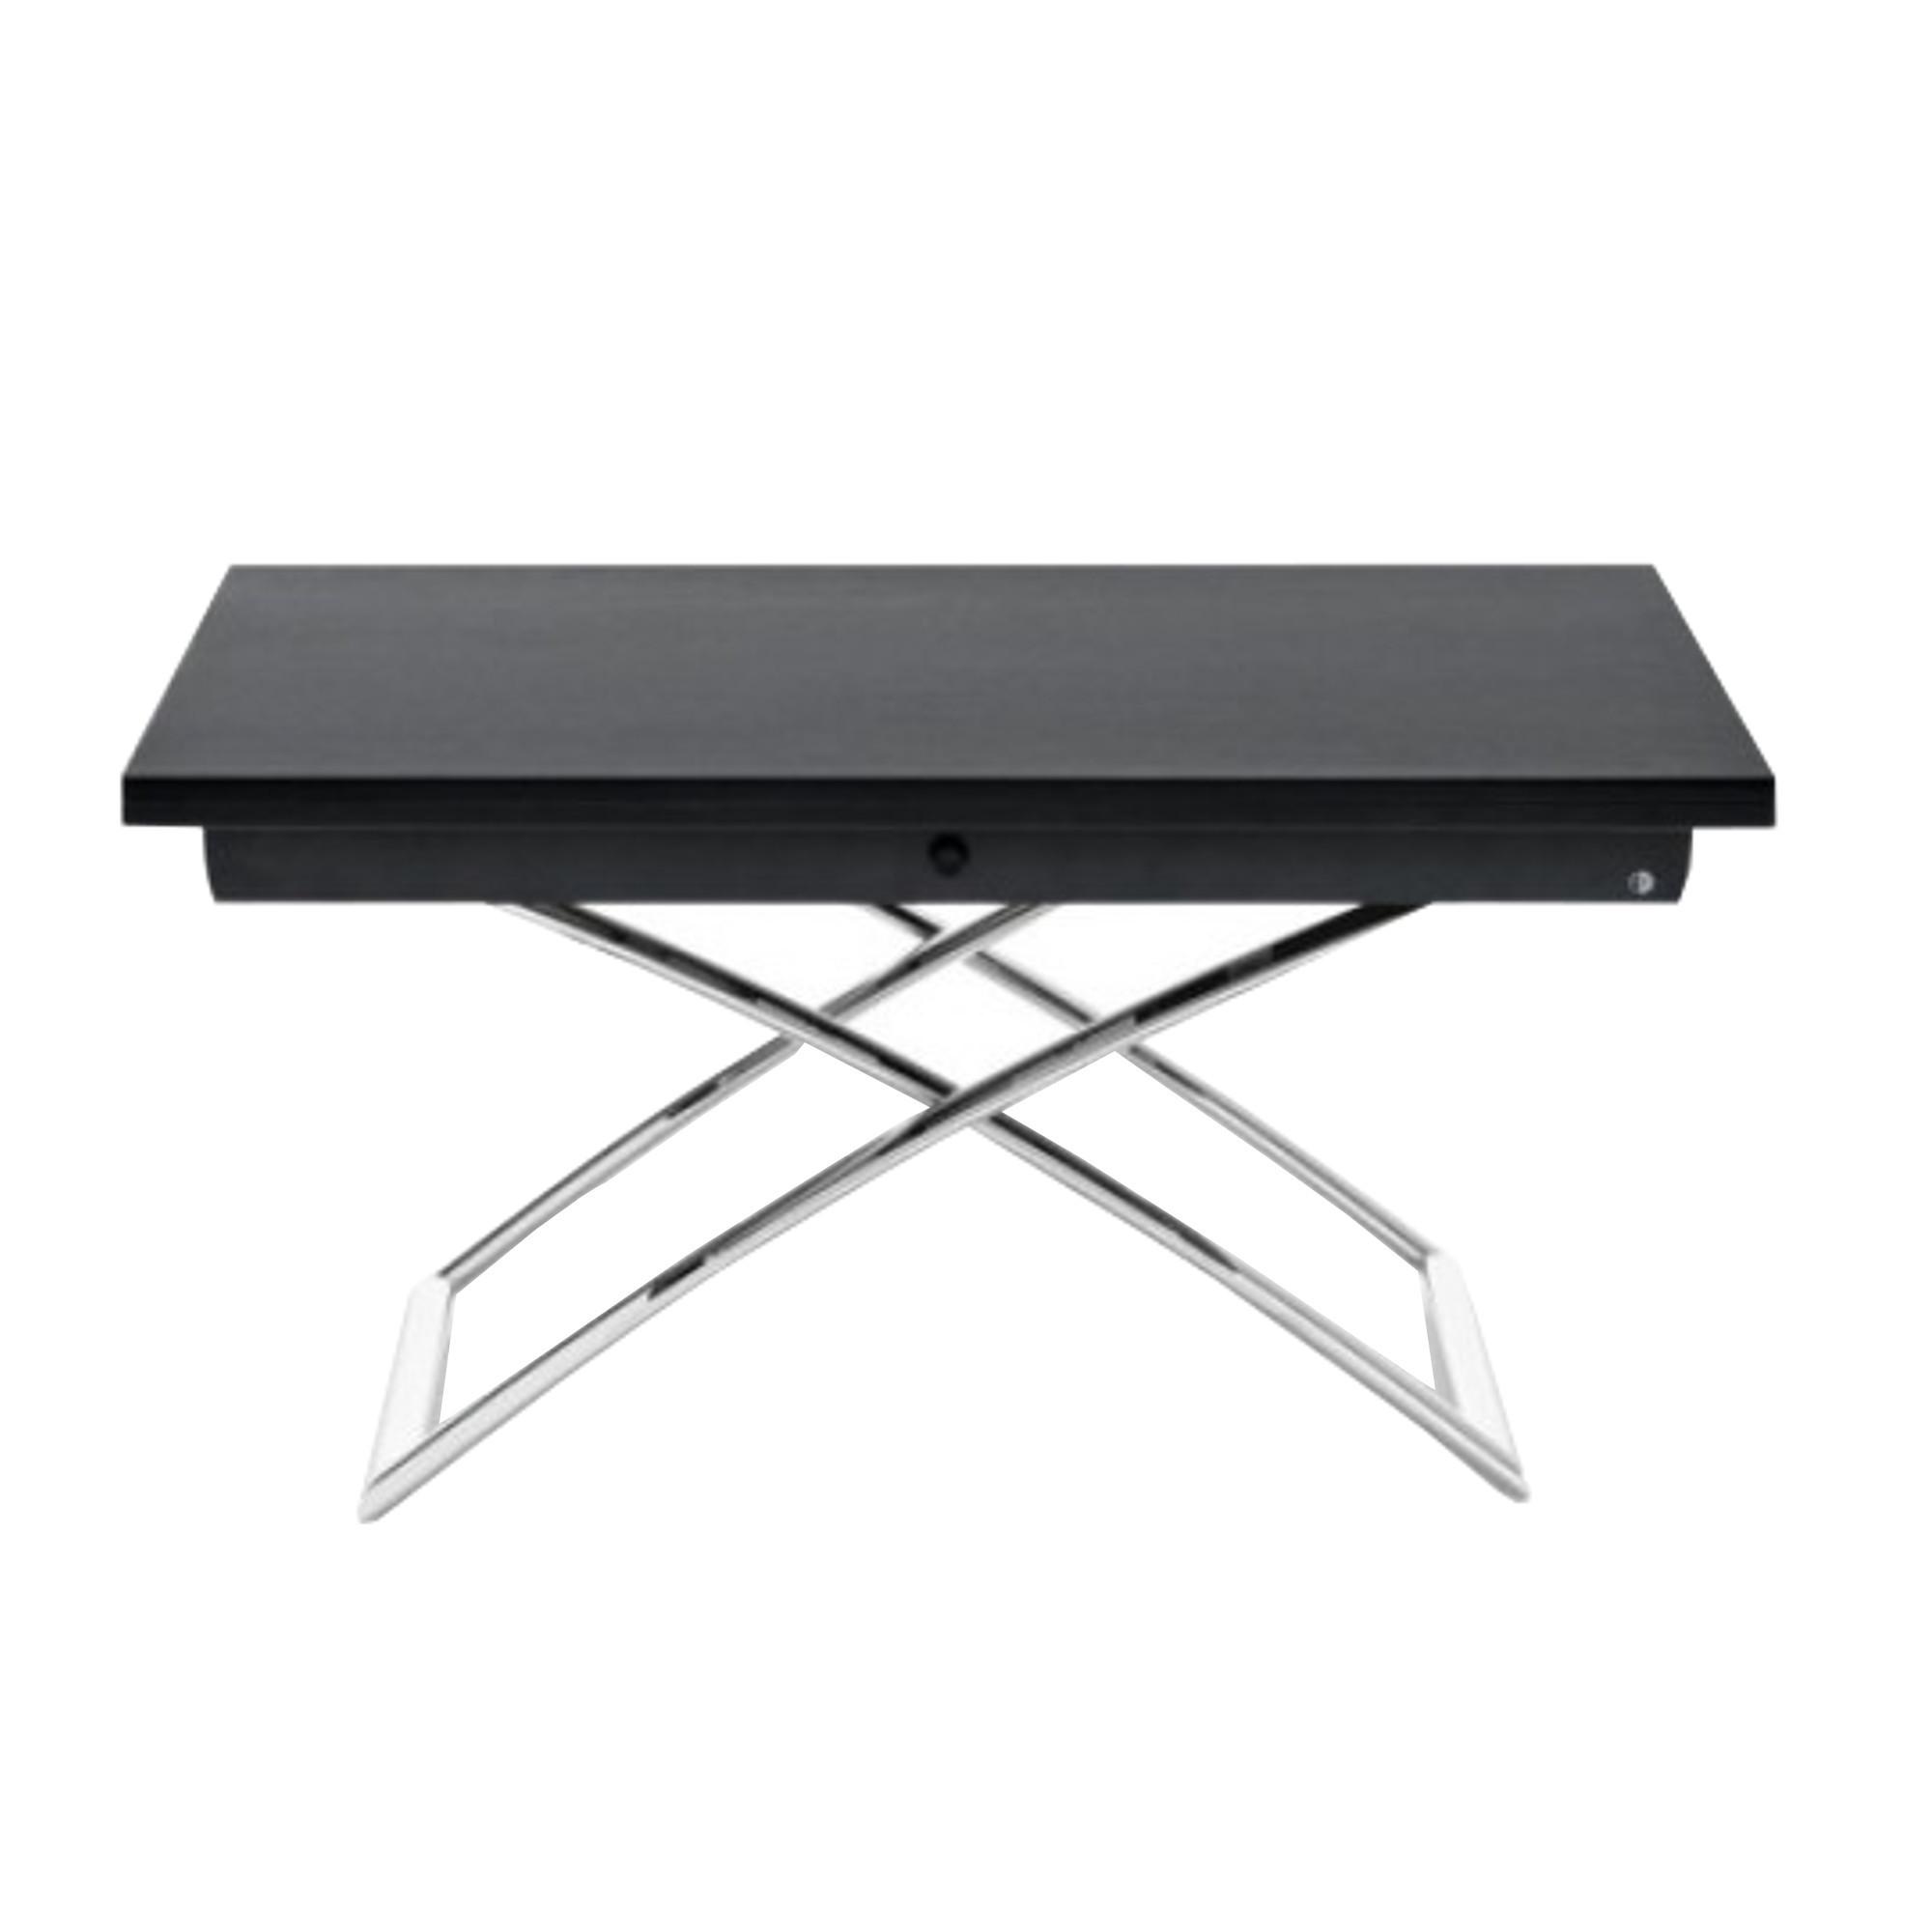 Magic J Extending Tables